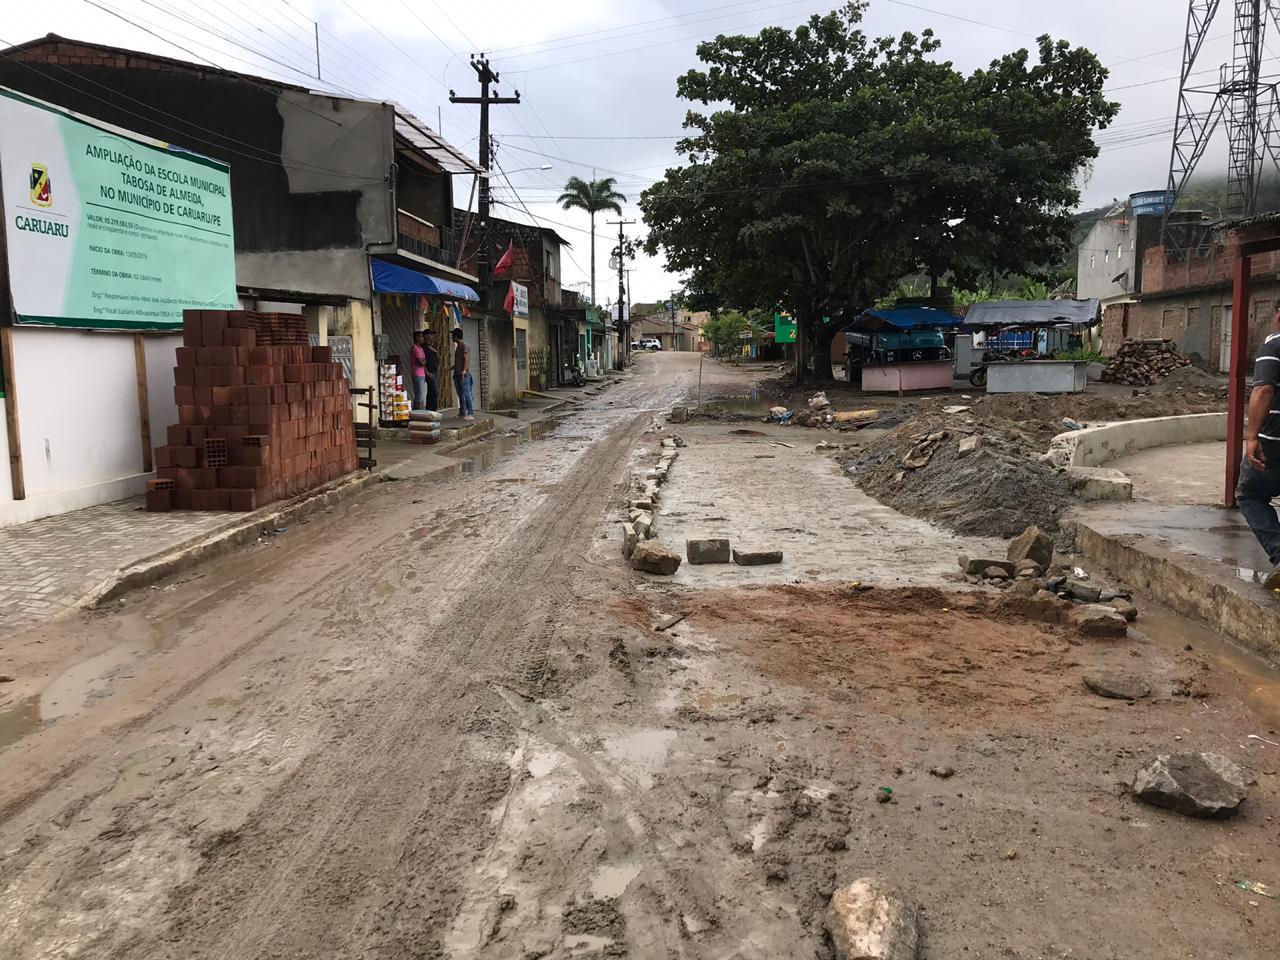 https://caruaru.pe.gov.br/wp-content/uploads/2020/01/foto-5-1.jpeg